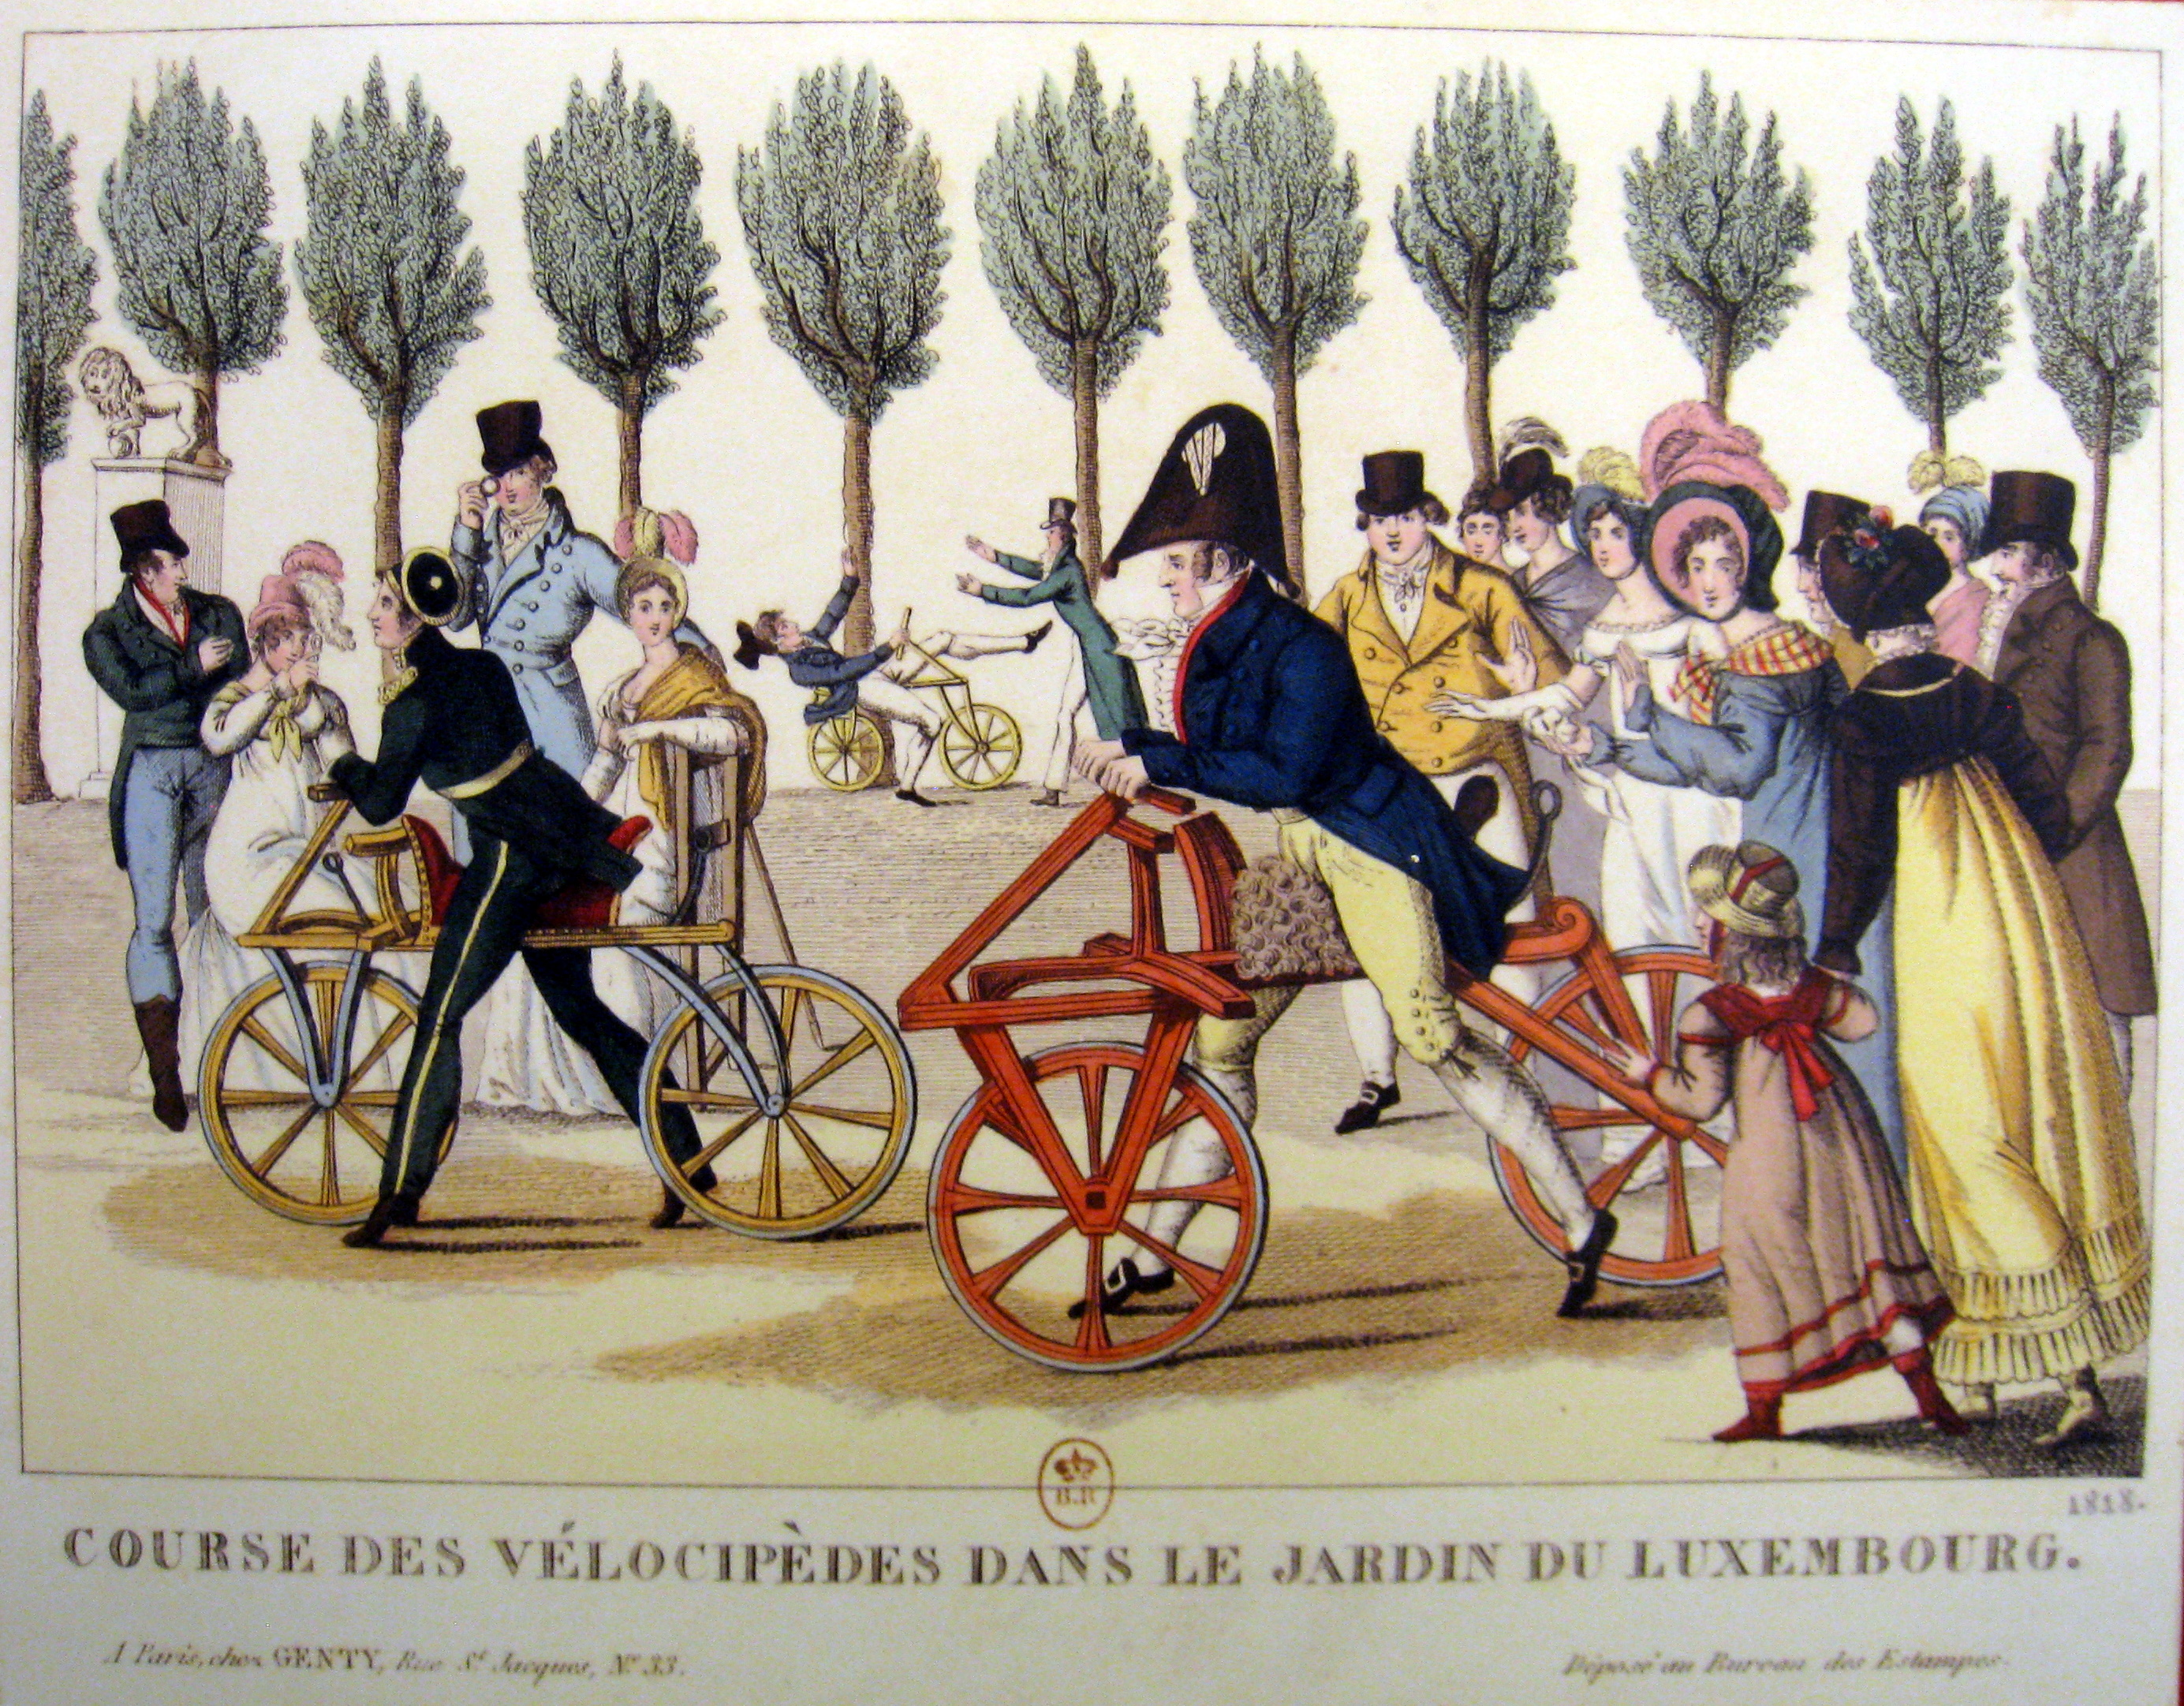 File:Velocipedes, Jardin de Luxembourg, 1818.JPG